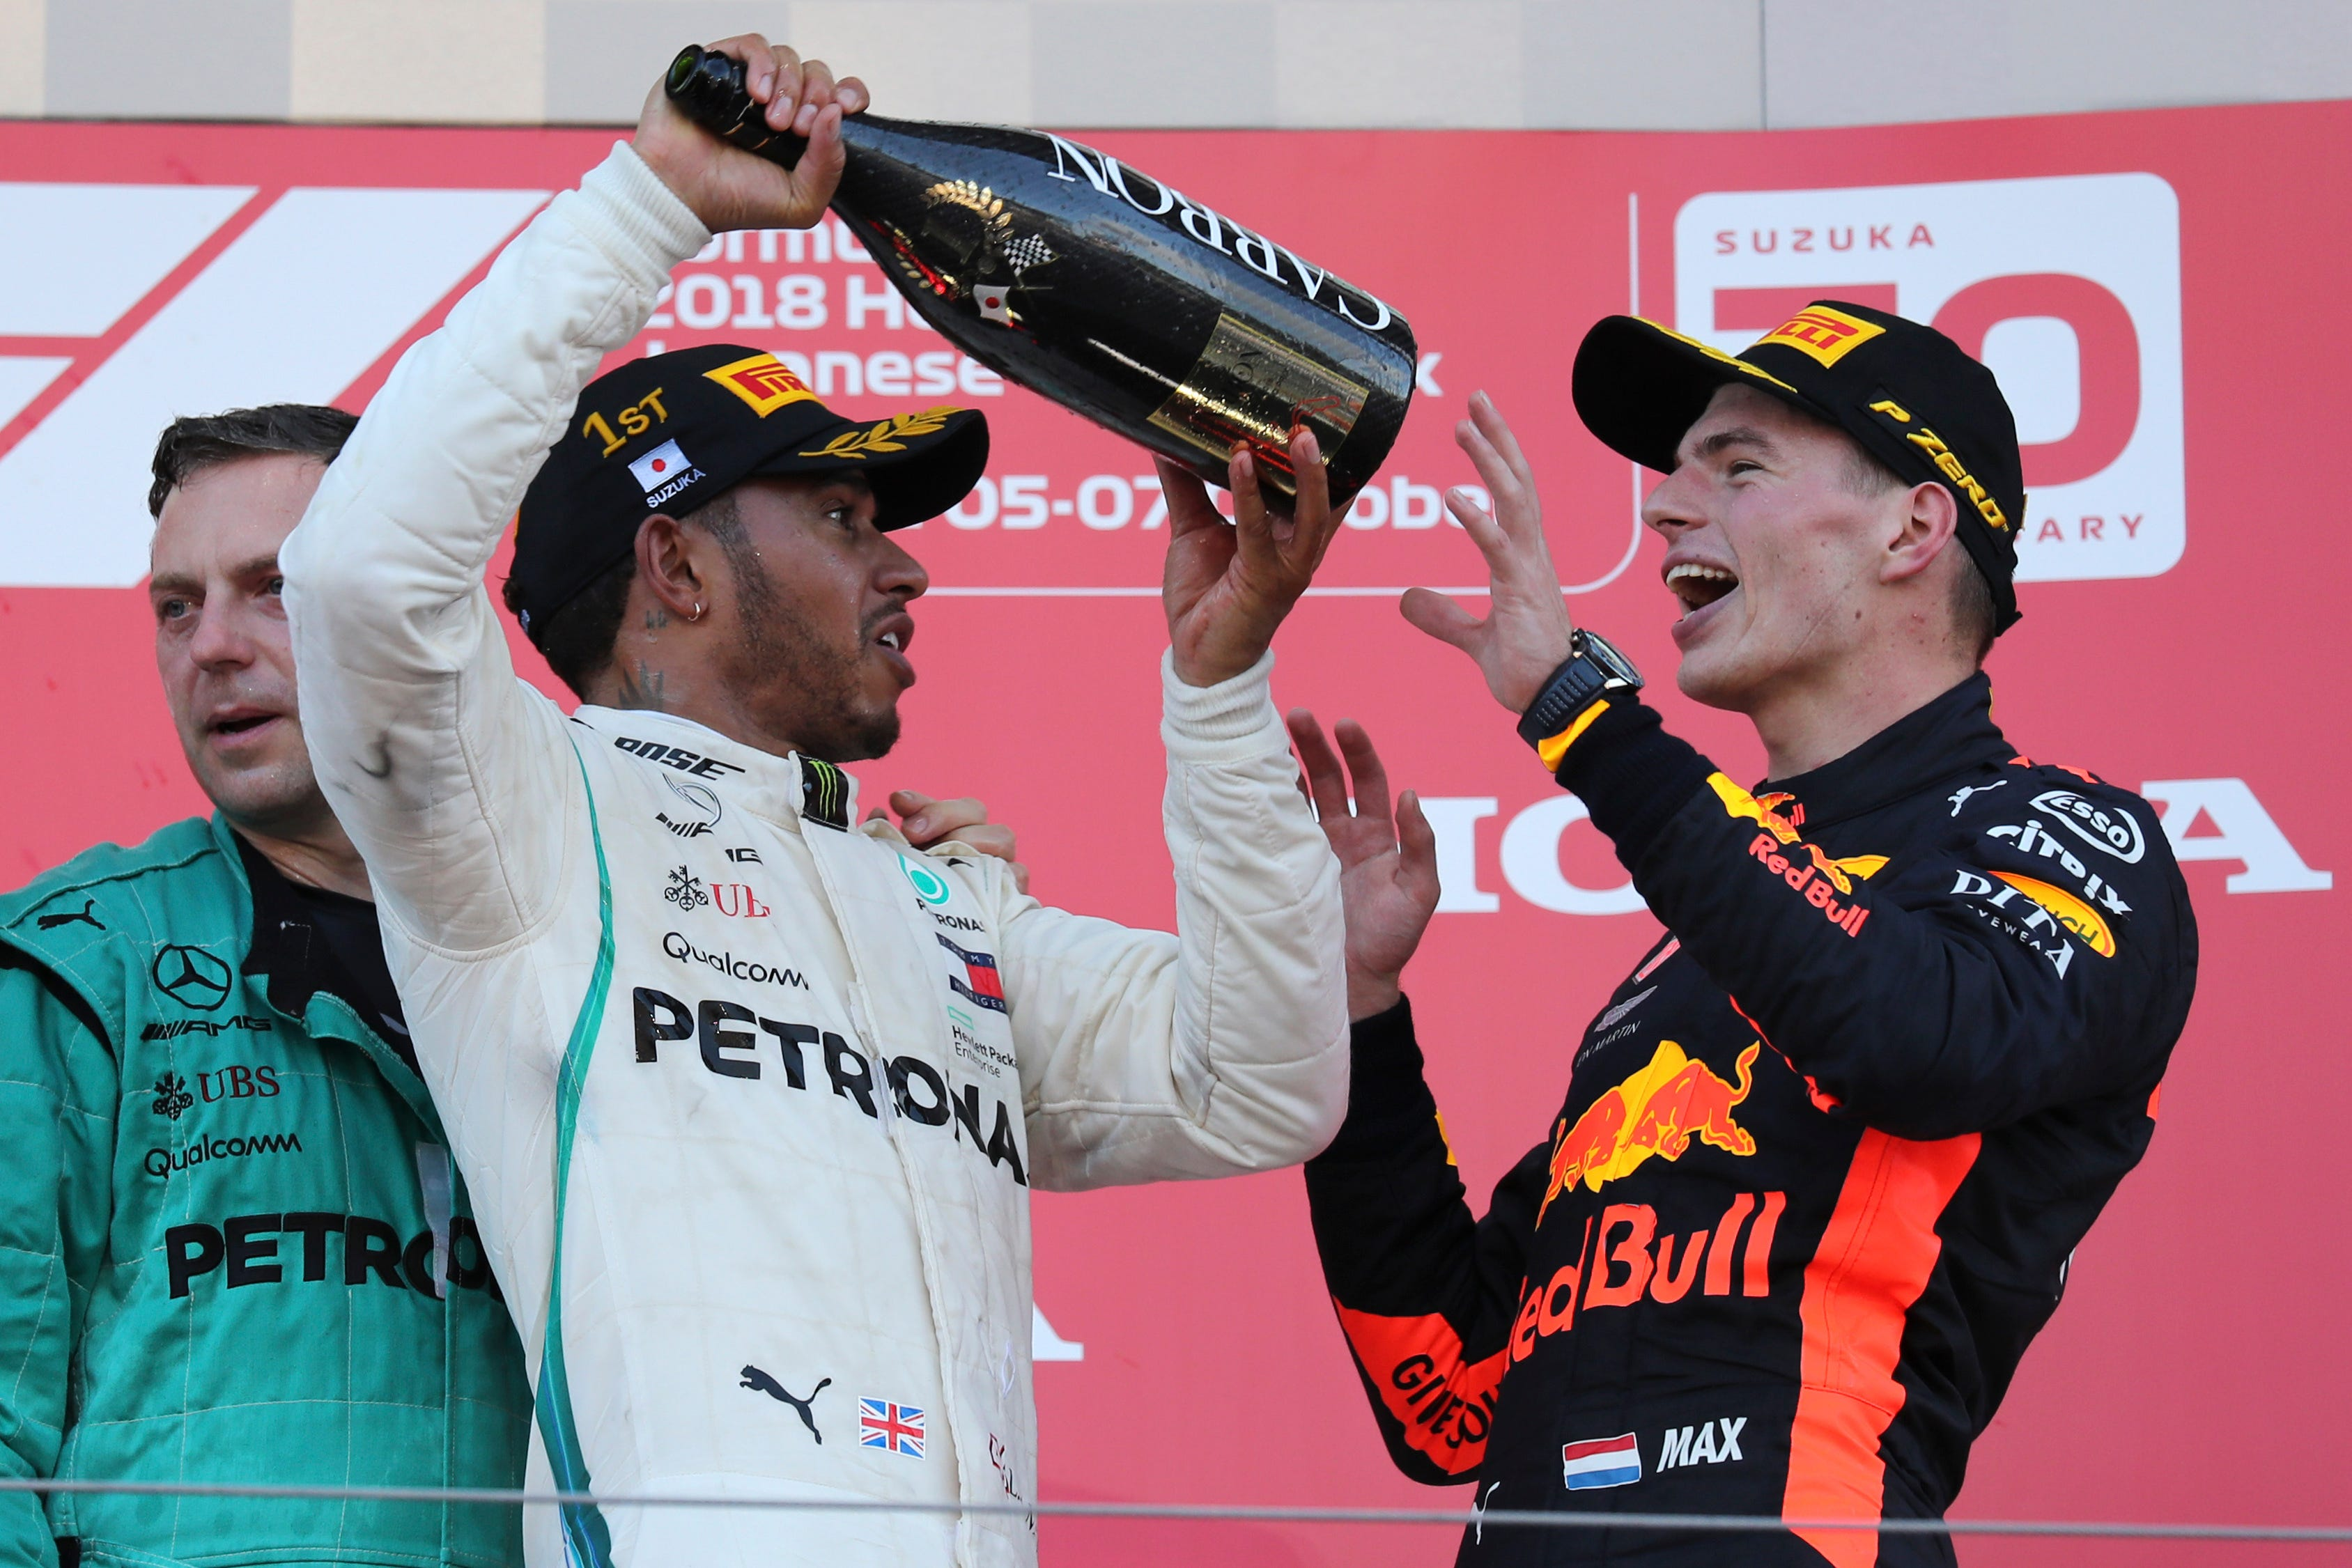 Australian Grand Prix to lead off F1 2019 schedule